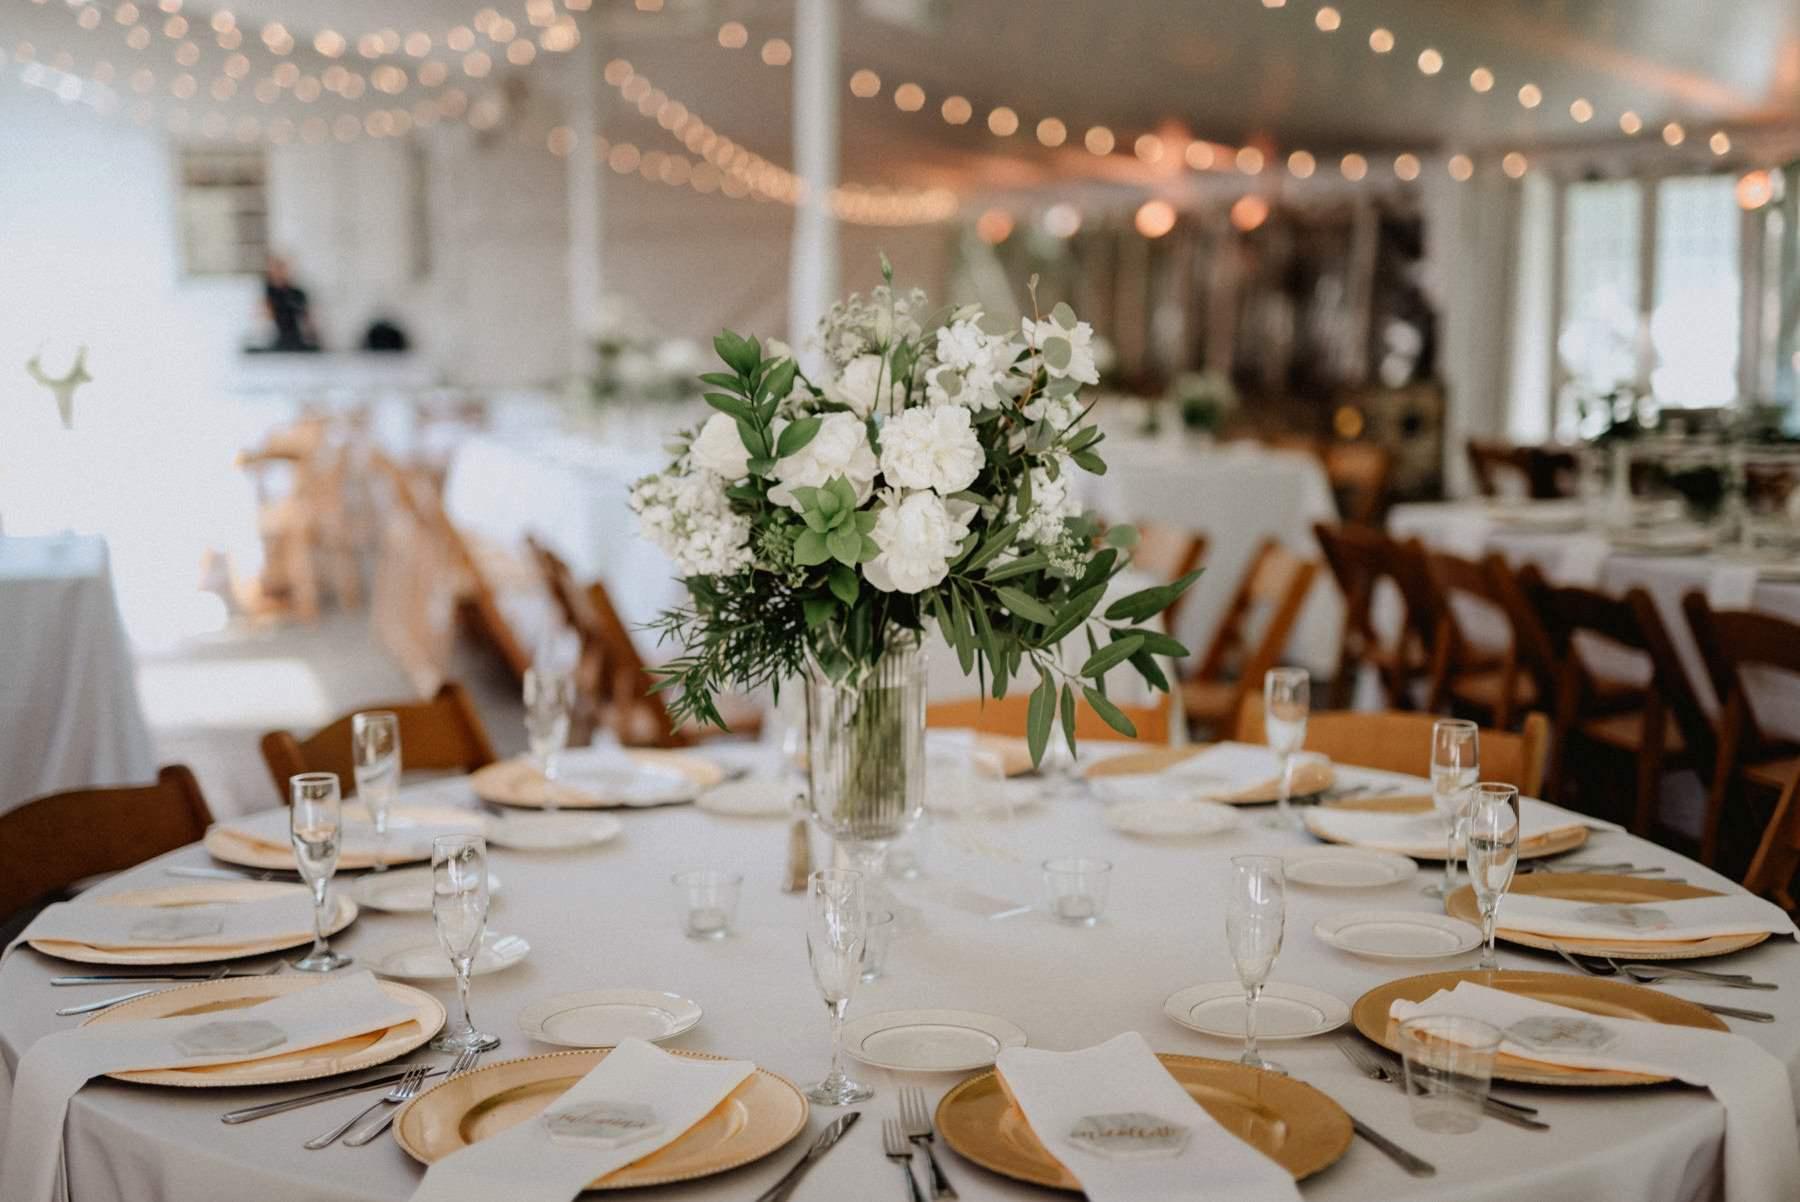 Appleford-estate-wedding-73.jpg